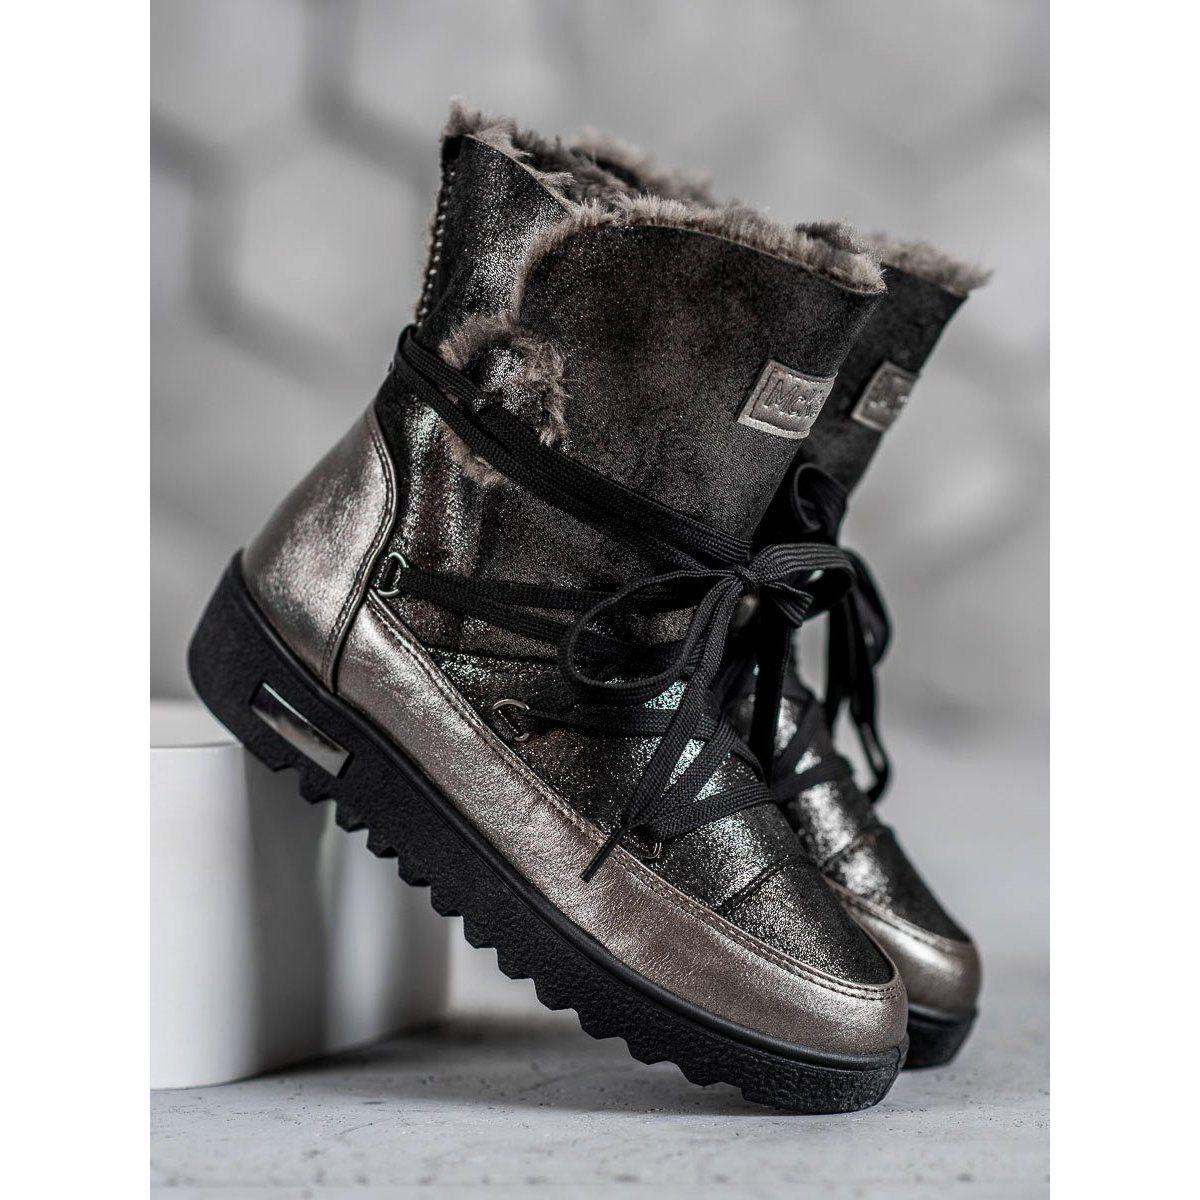 Sniegowce Z Brokatem Mckeylor Szare Boots Snow Boots Women Snow Boots